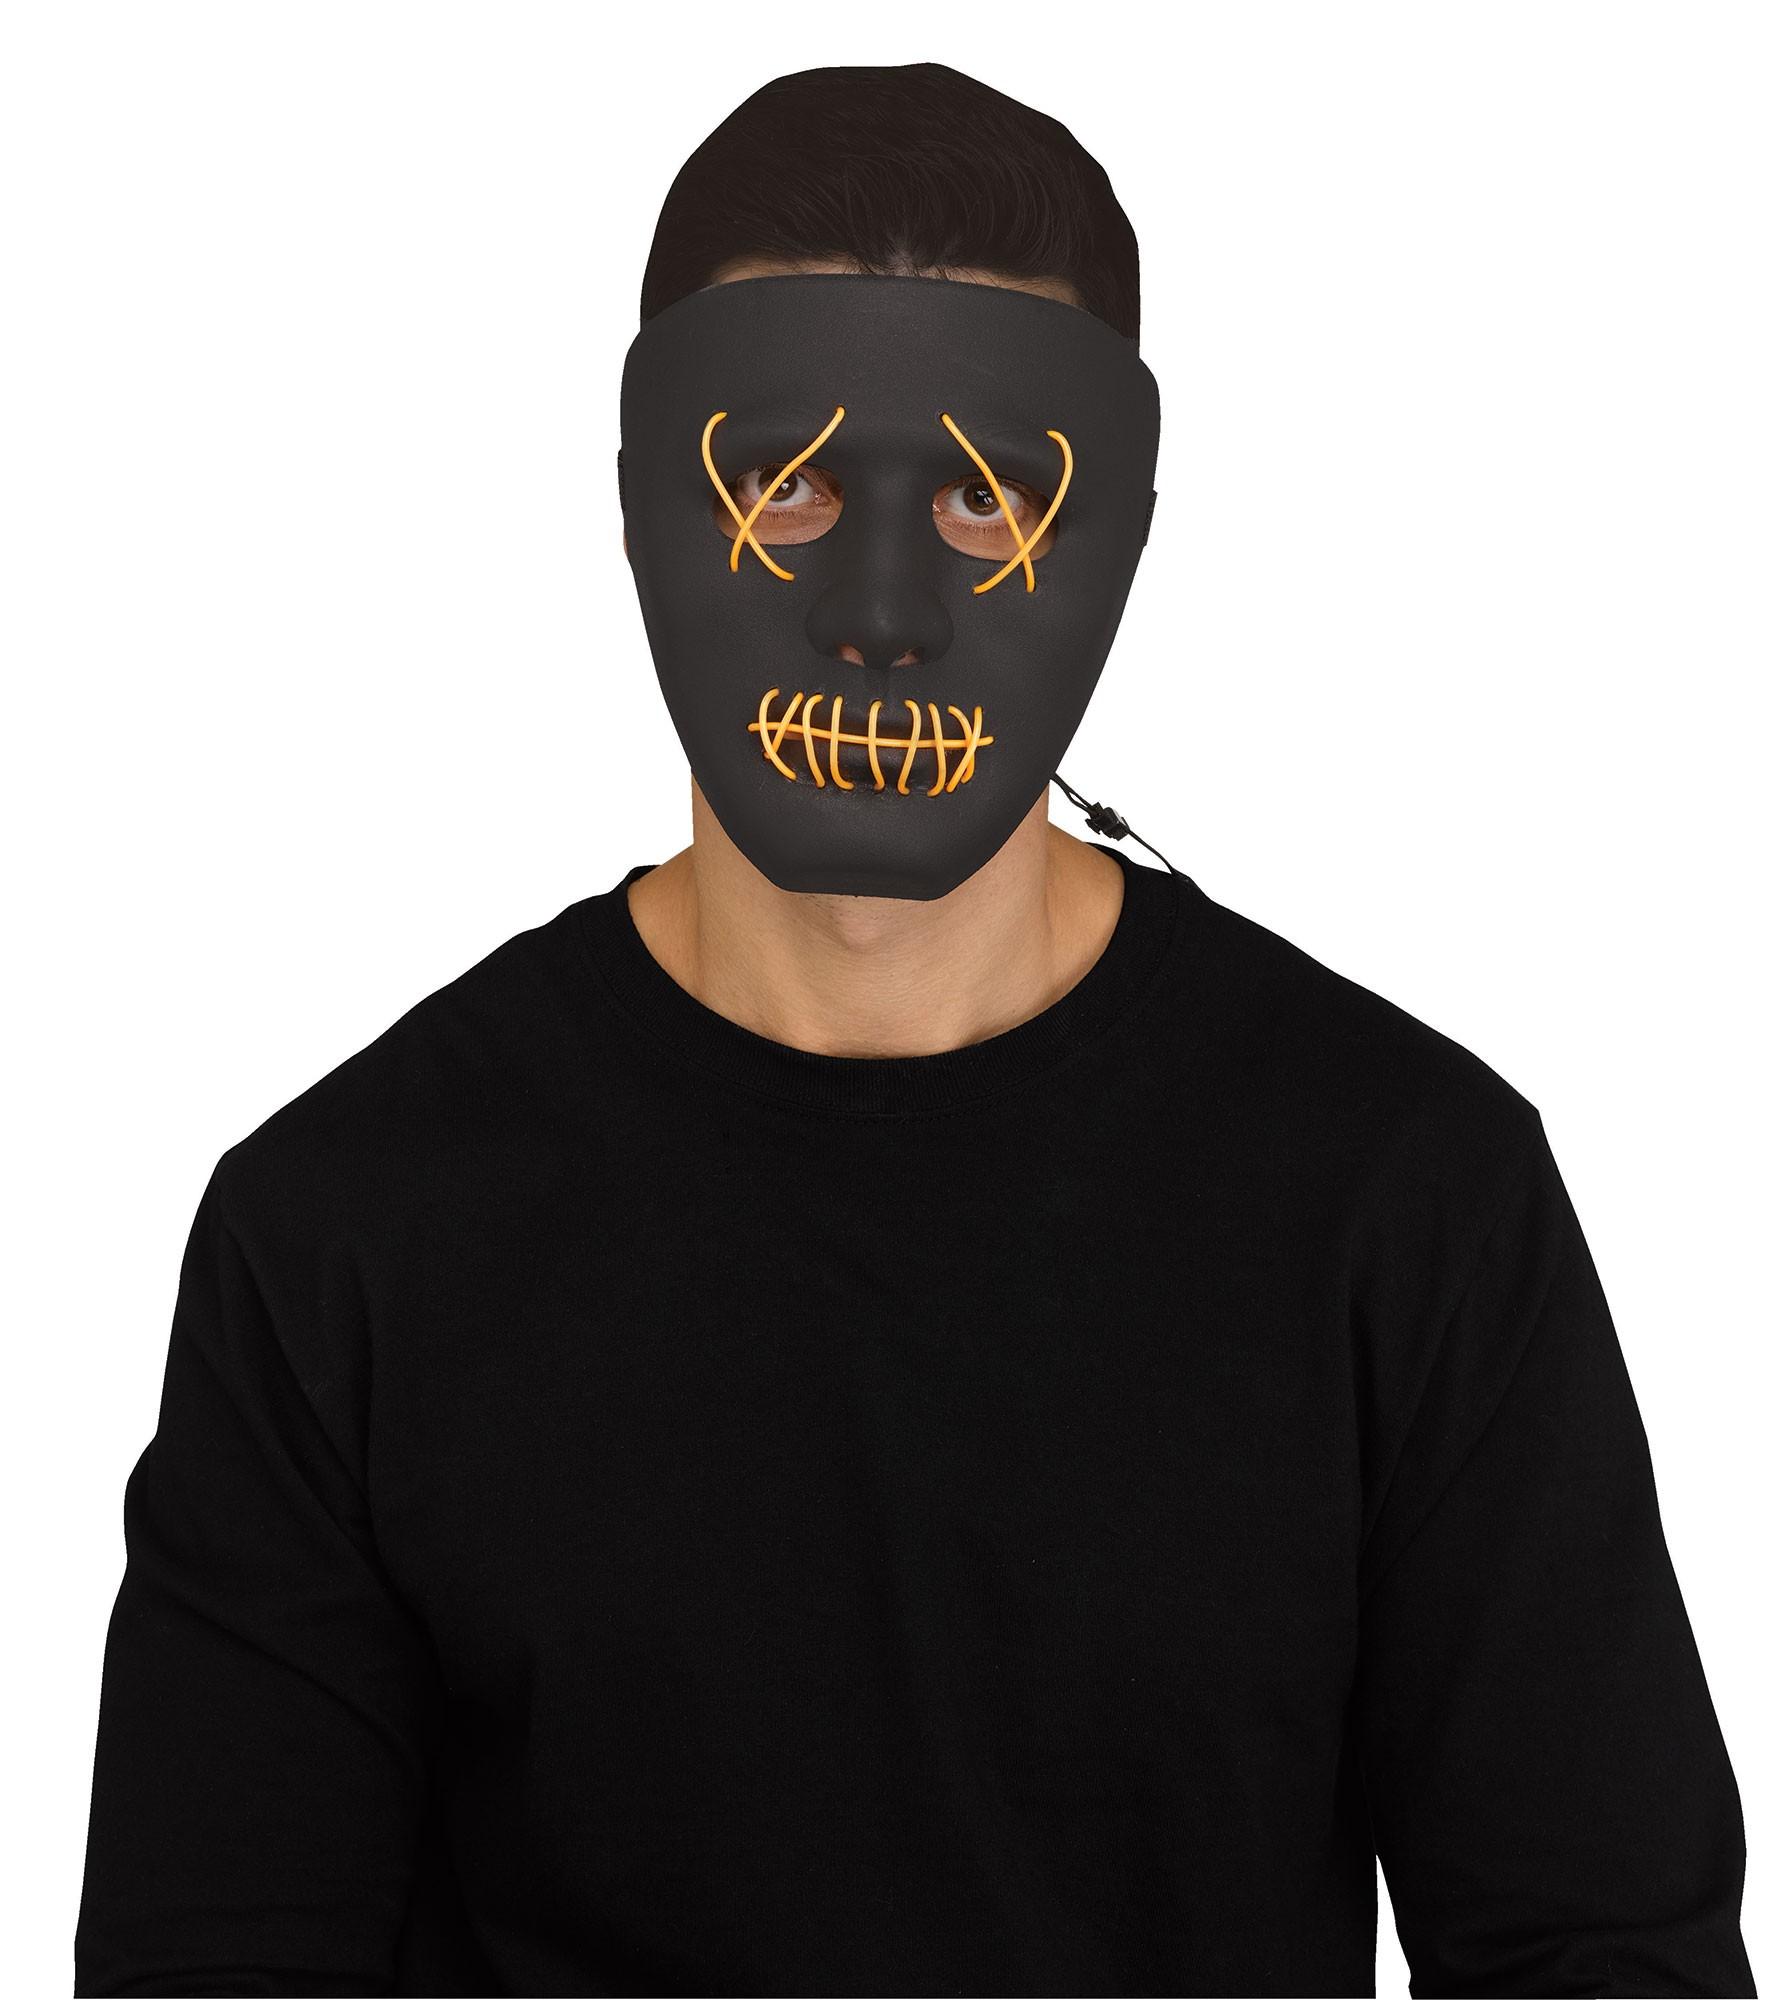 Fun World Scary Glowing Illumo Battery Powered Halloween Mask, One-Size